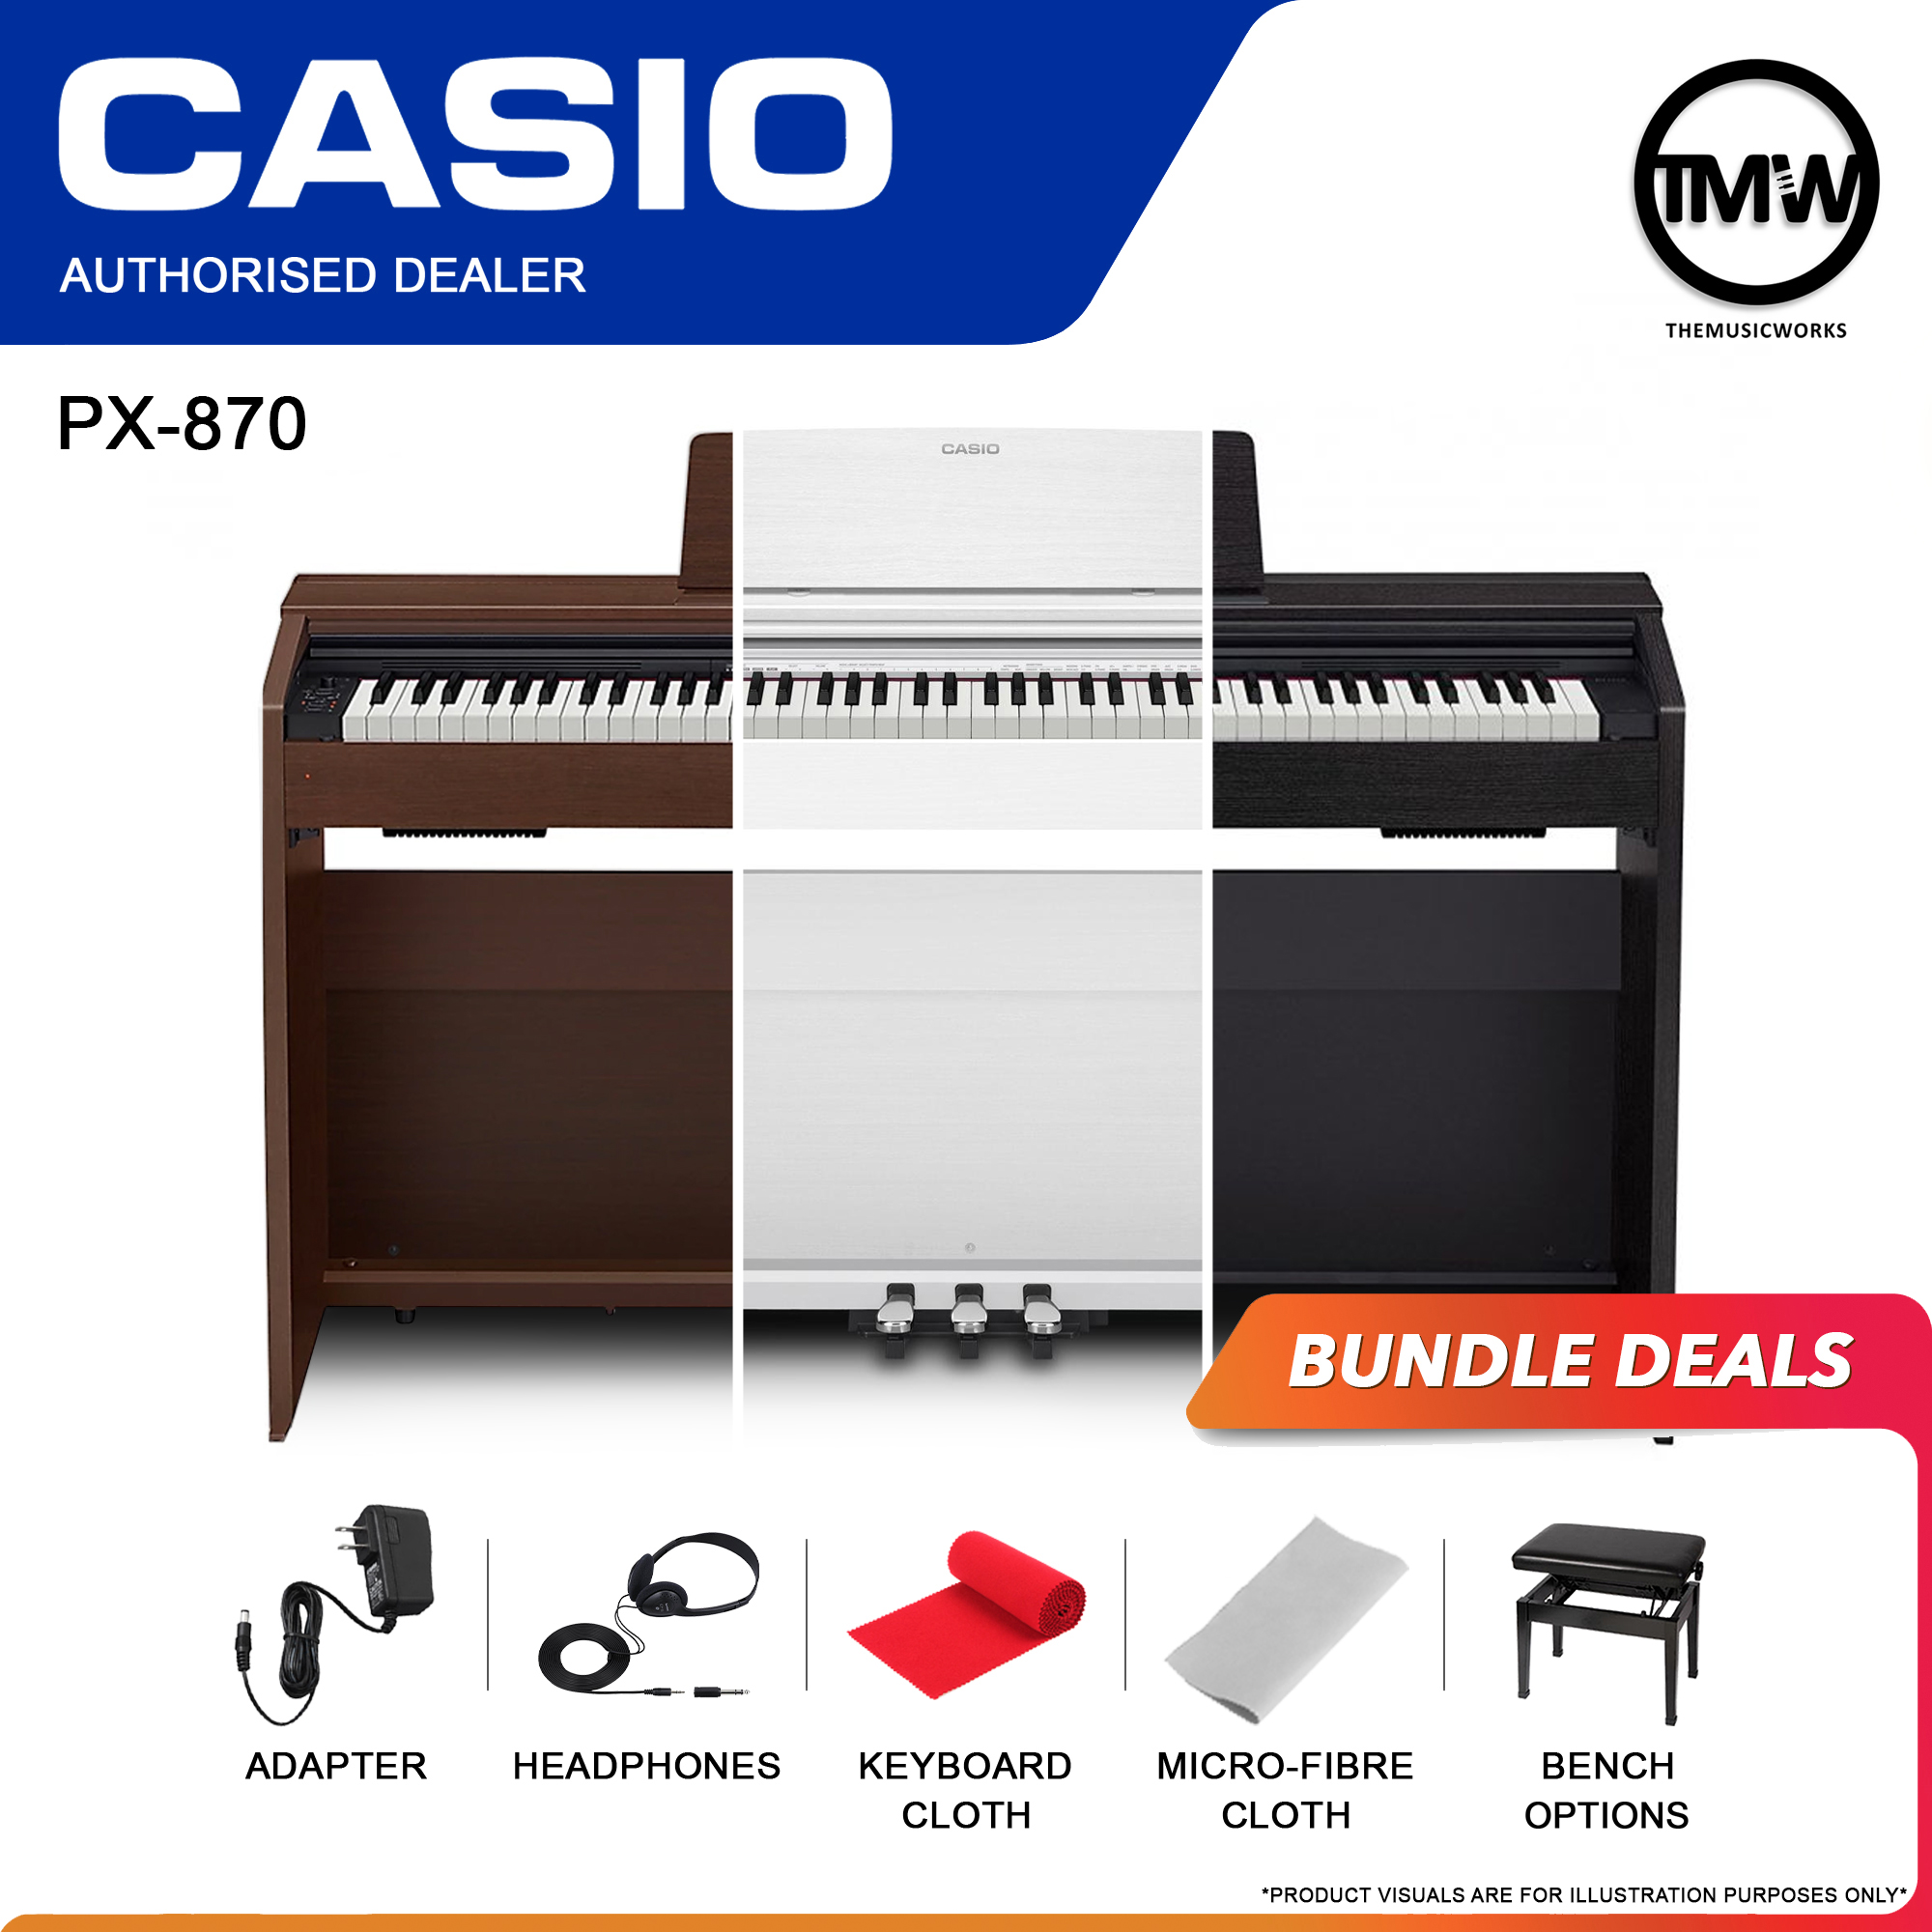 casio px-870 bundel deals